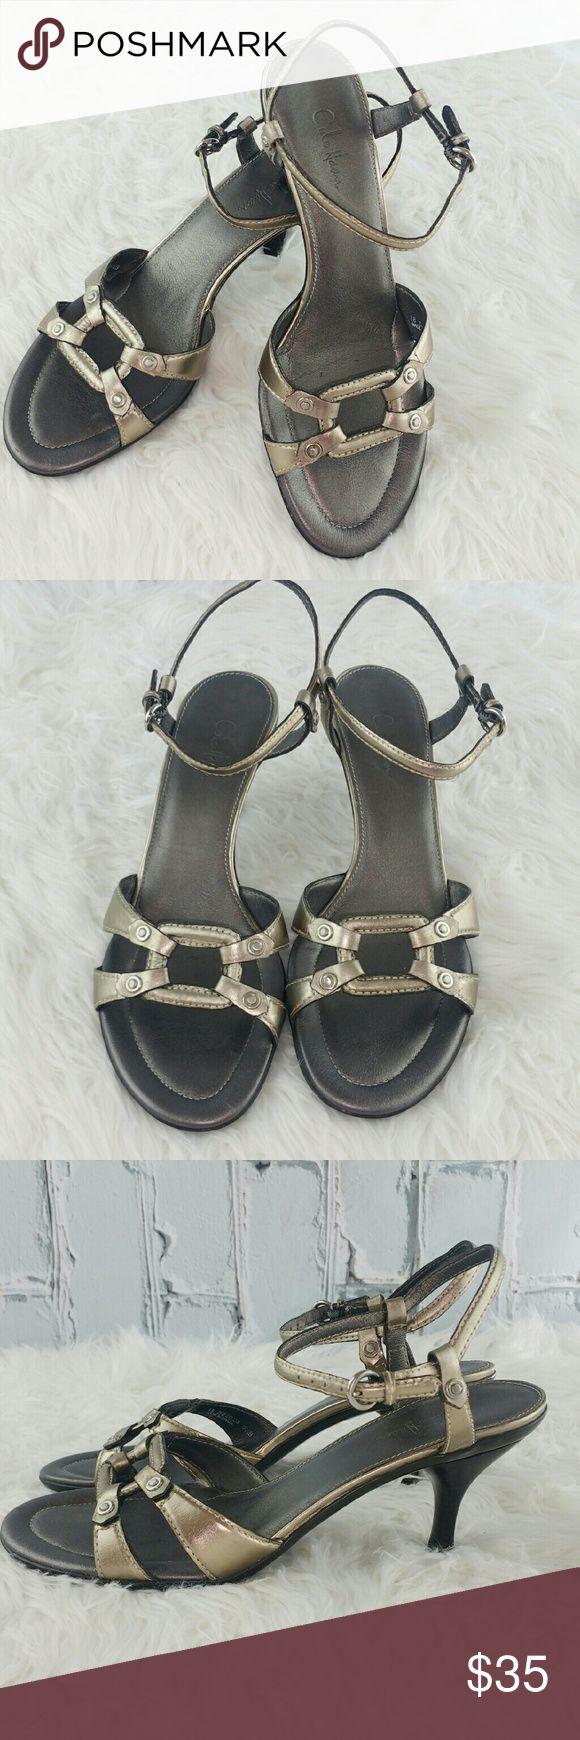 "💞SALE💞 Beautiful Silver Cole Haan Sandles Beautiful Silver Cole Haan Sandles 3"" heel Great Condition Cole Haan Shoes Sandals"